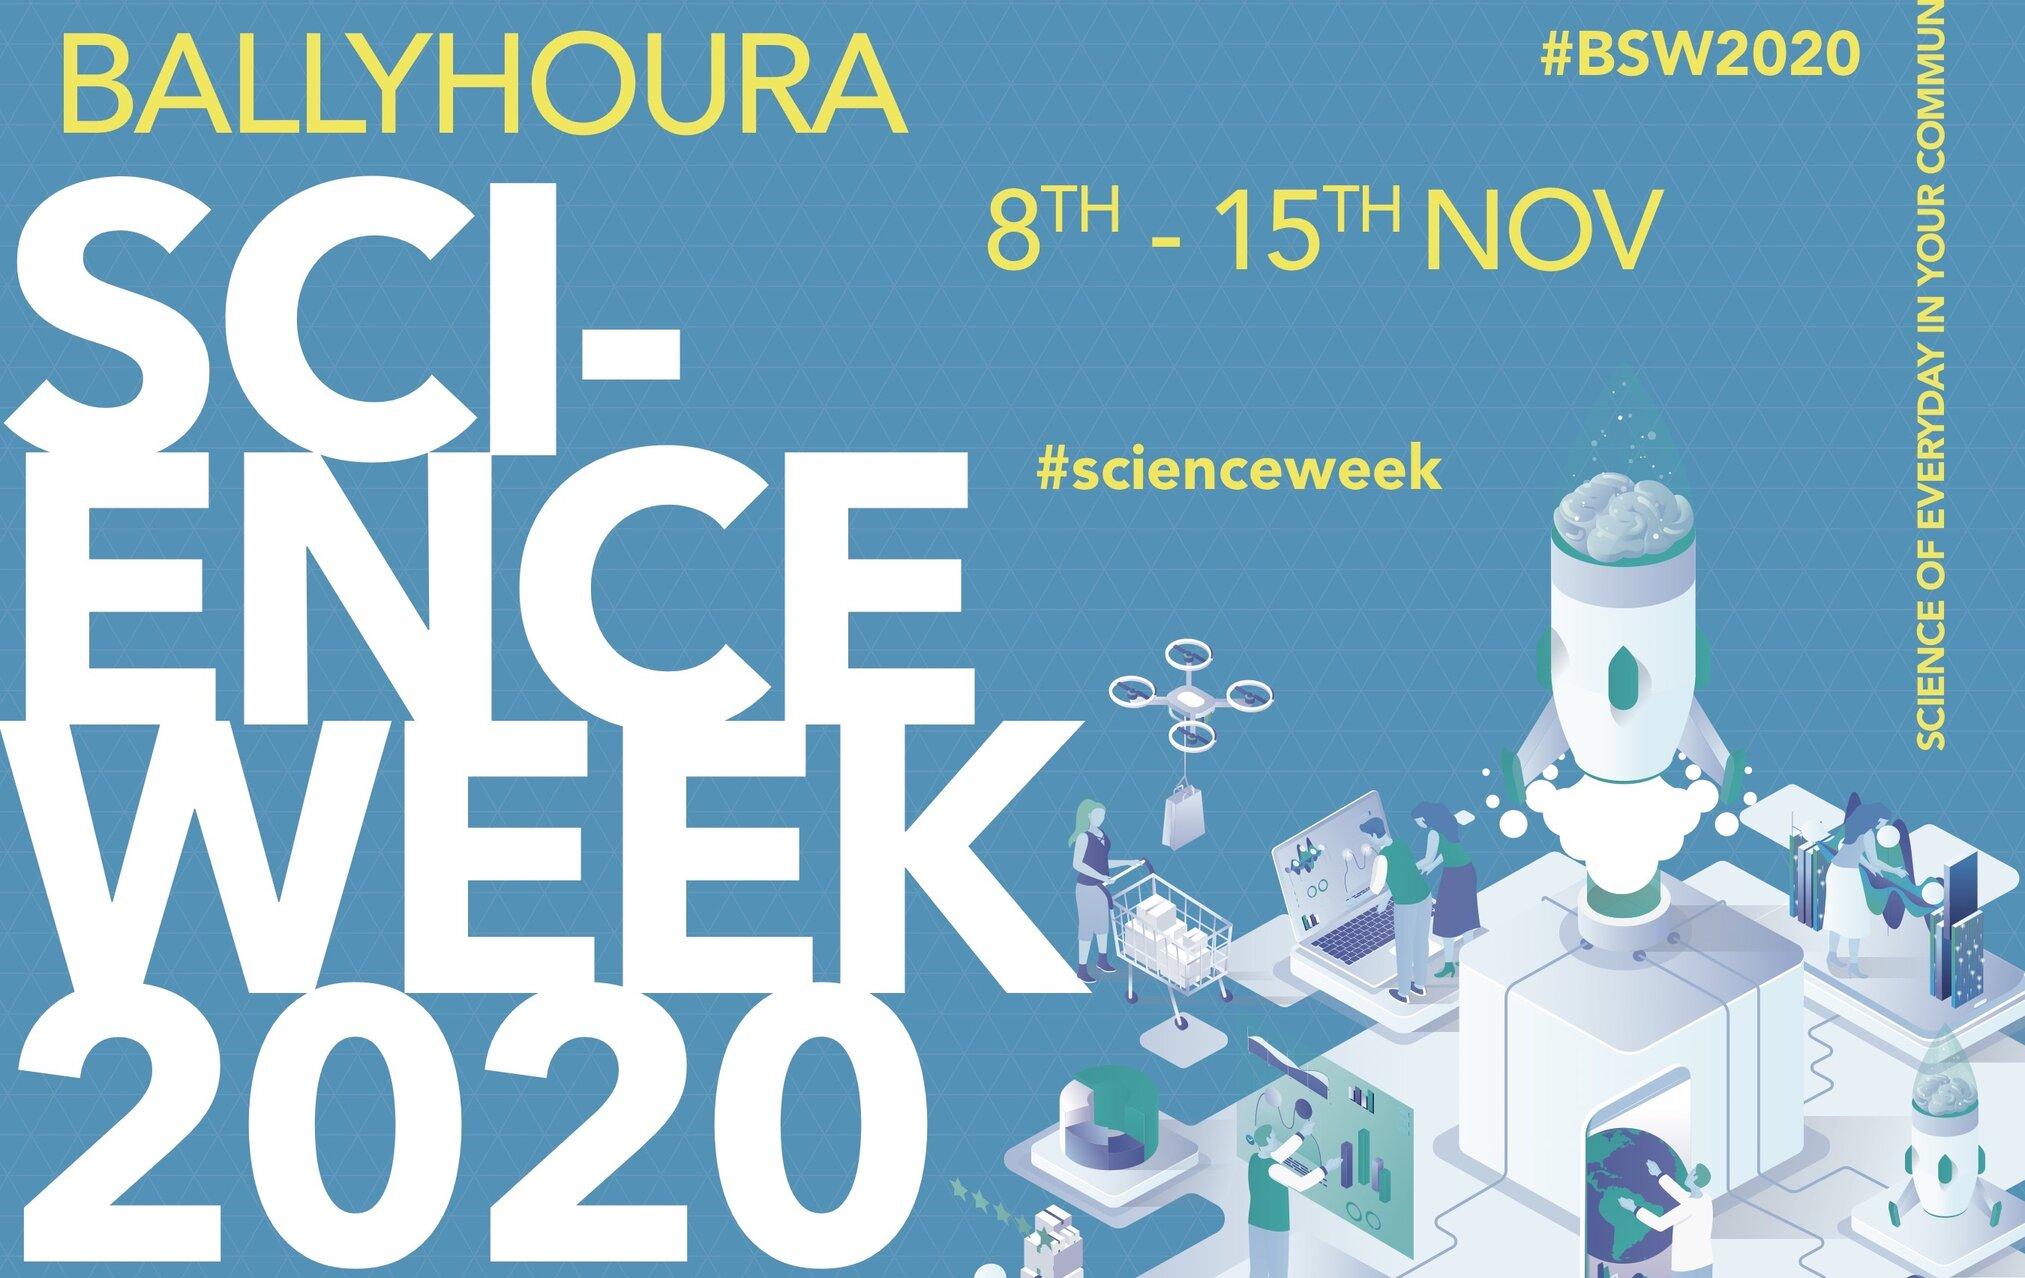 Ballyhoura Science Week 2020